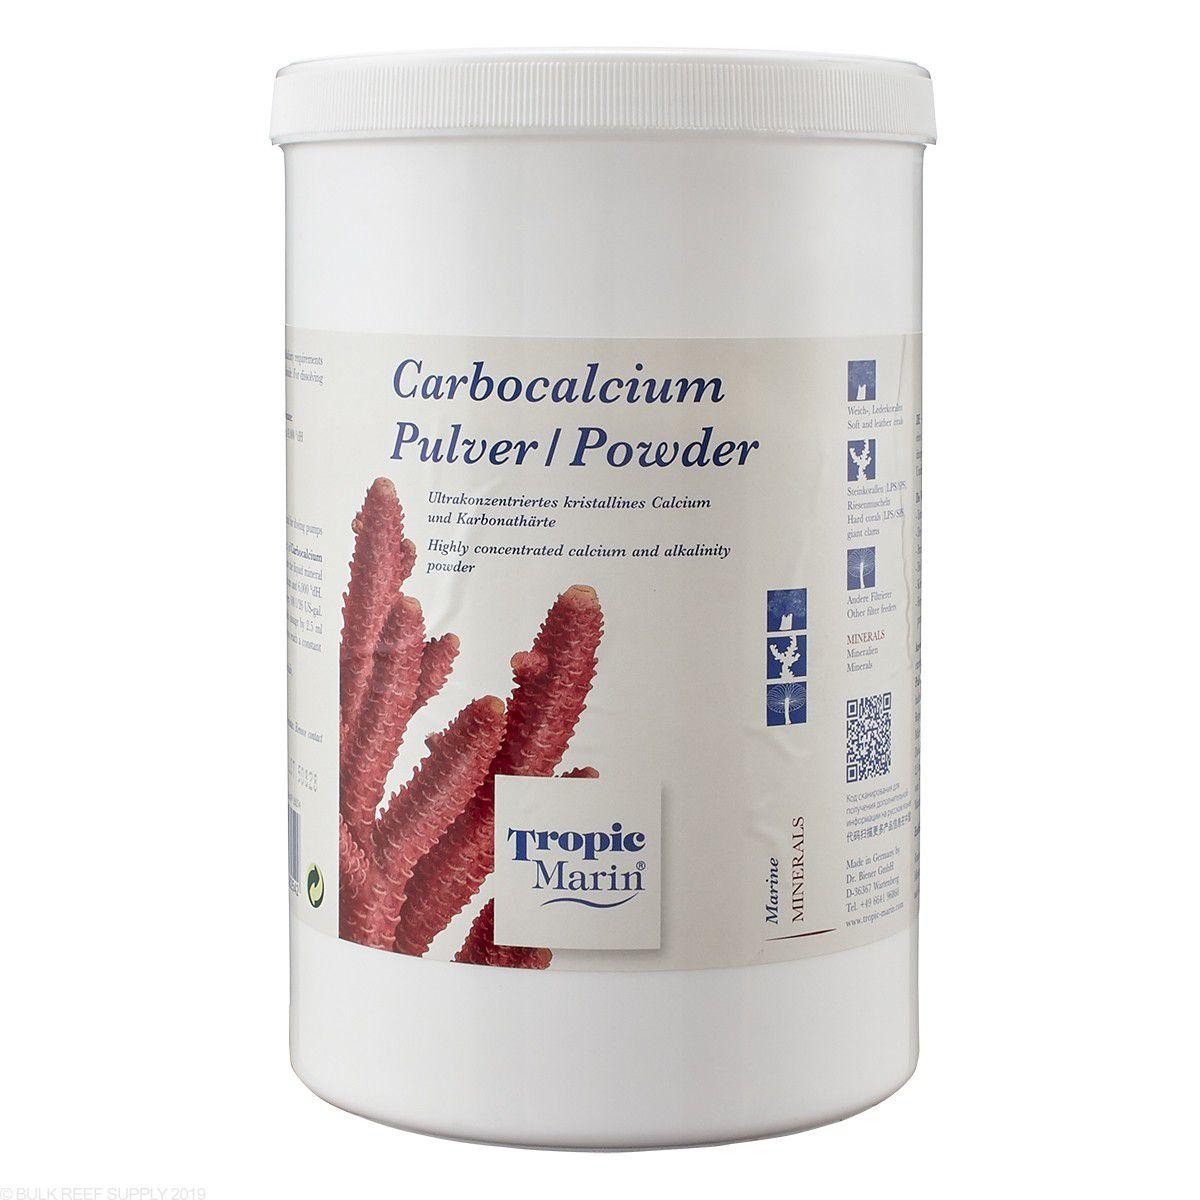 Tropic Marin Carbocalcium em Pó Balling Ca Kh - 1400g